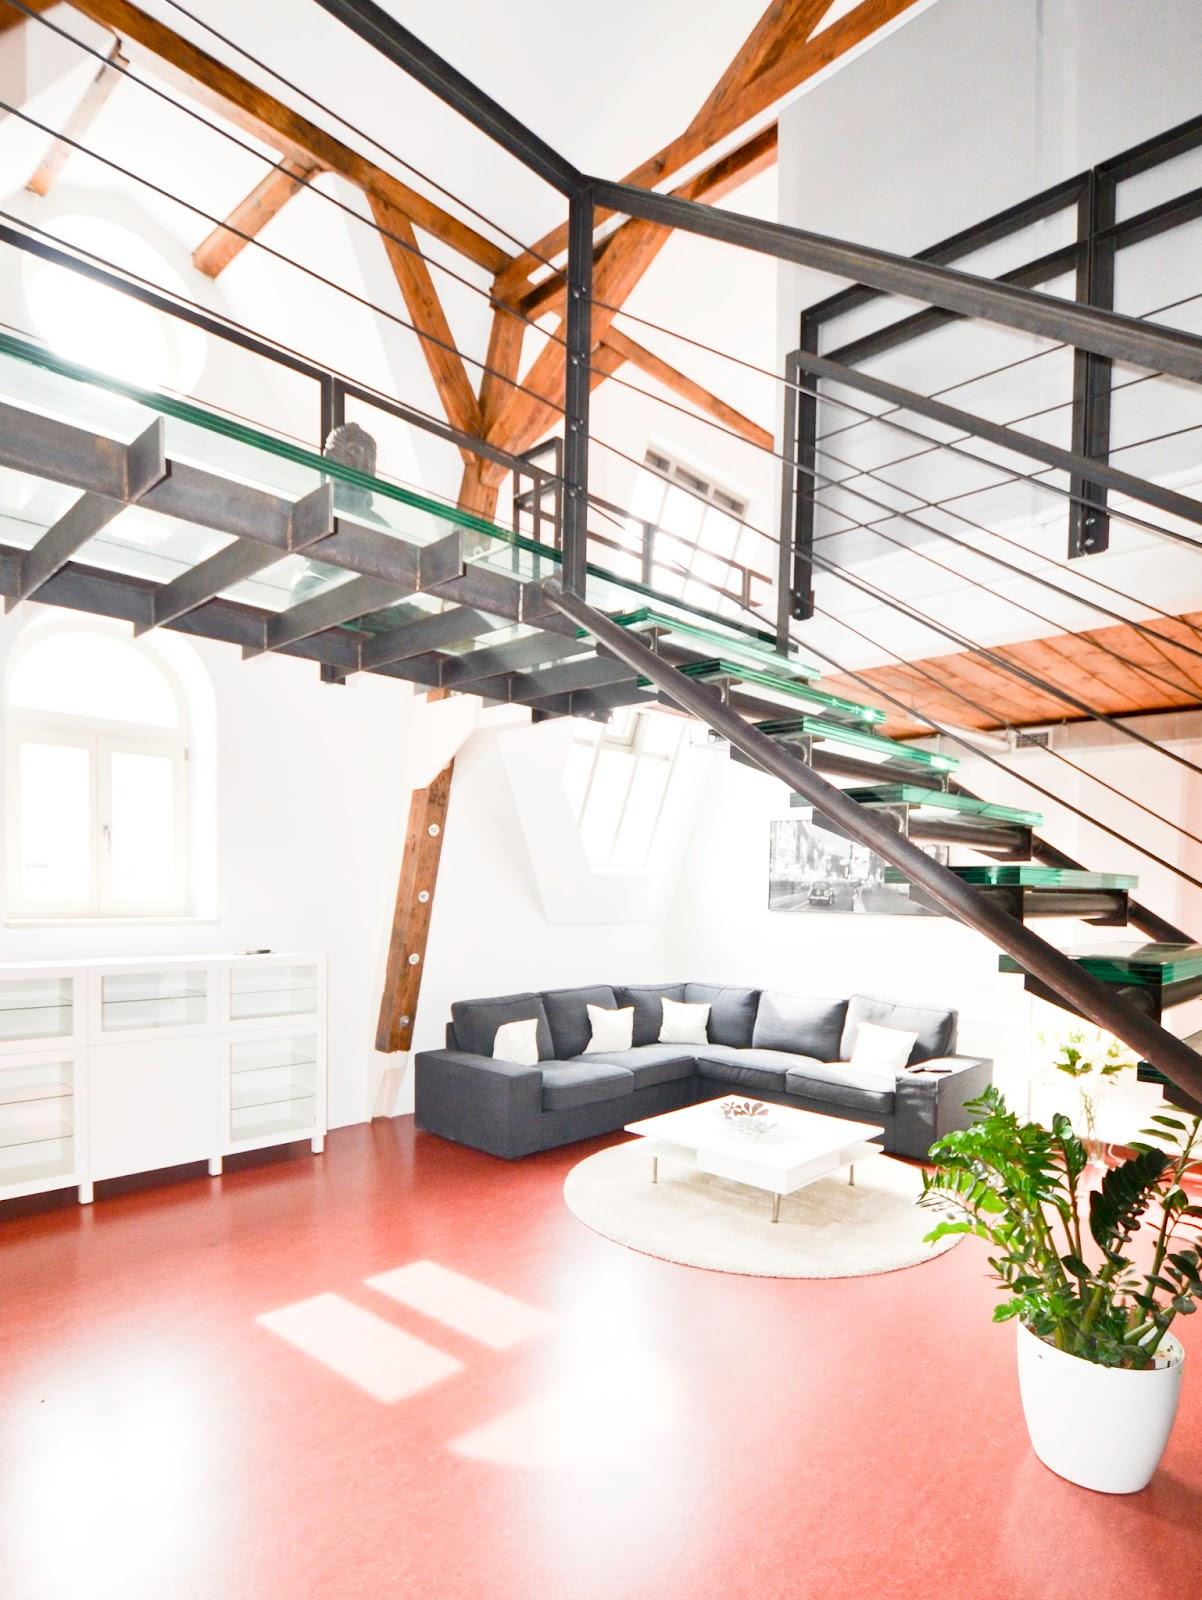 Chic Industrial LOFT Airbnb in Prague 1 - www.navkbrar.blogspot.com